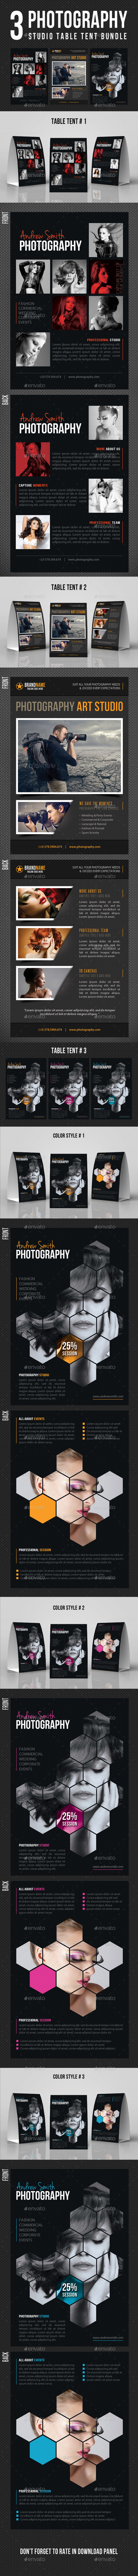 3 Photography Studio Table Tent Bundle 01 - Miscellaneous Print Templates